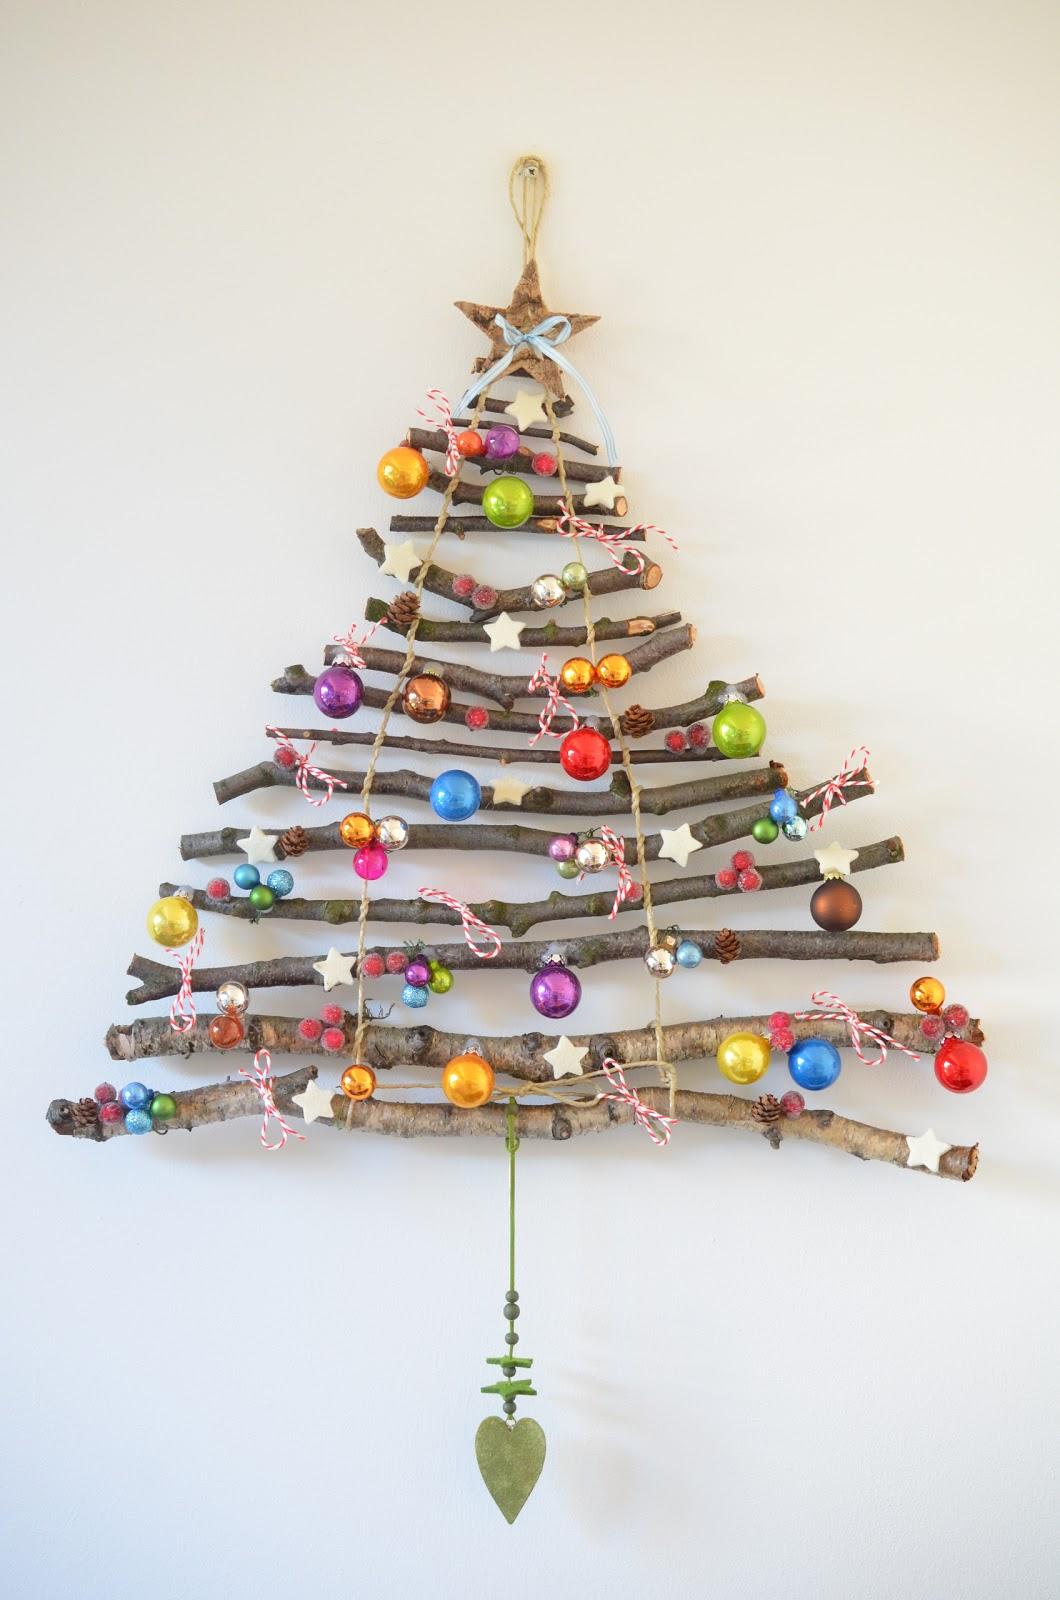 berall nirgendwo pamk weihnachtsbaum to go. Black Bedroom Furniture Sets. Home Design Ideas